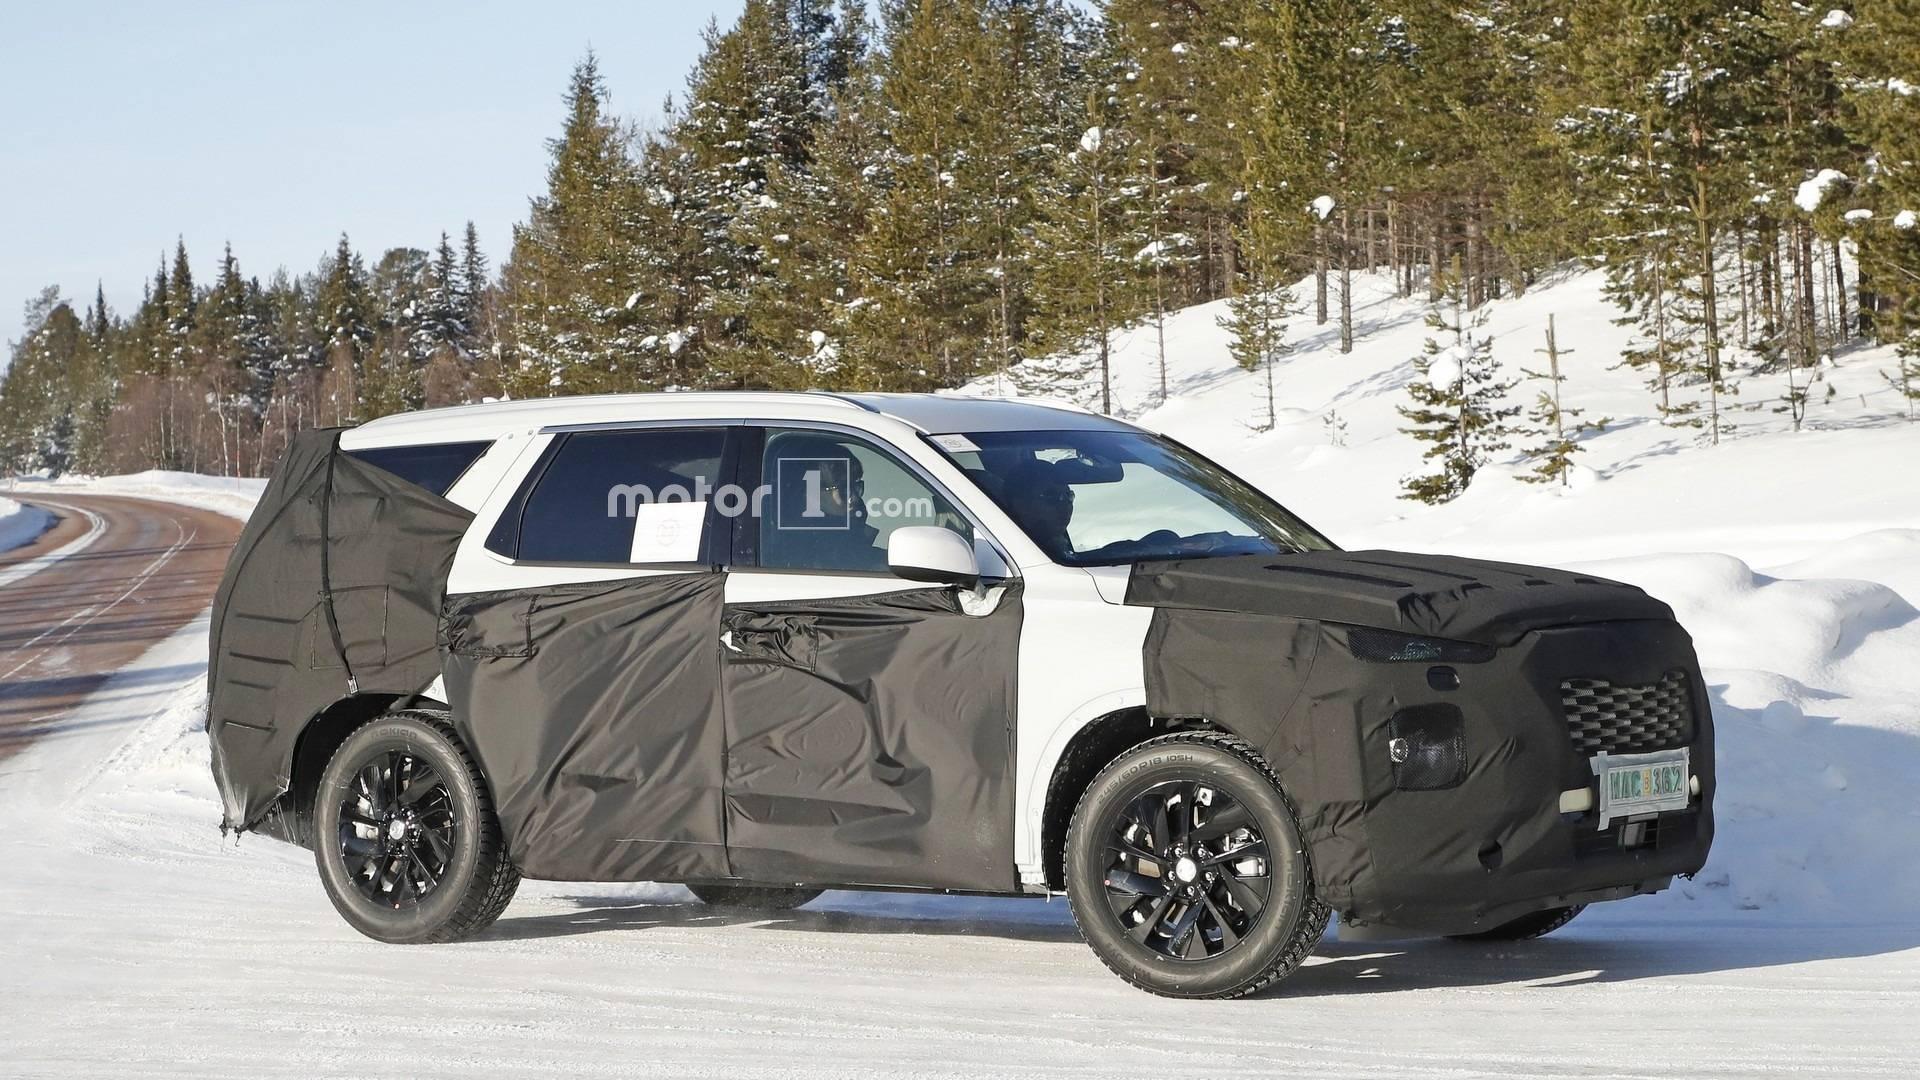 8 Passenger Suv >> 8 Seat Hyundai Suv Makes 18 Inch Wheels Look Small In Spy Shots